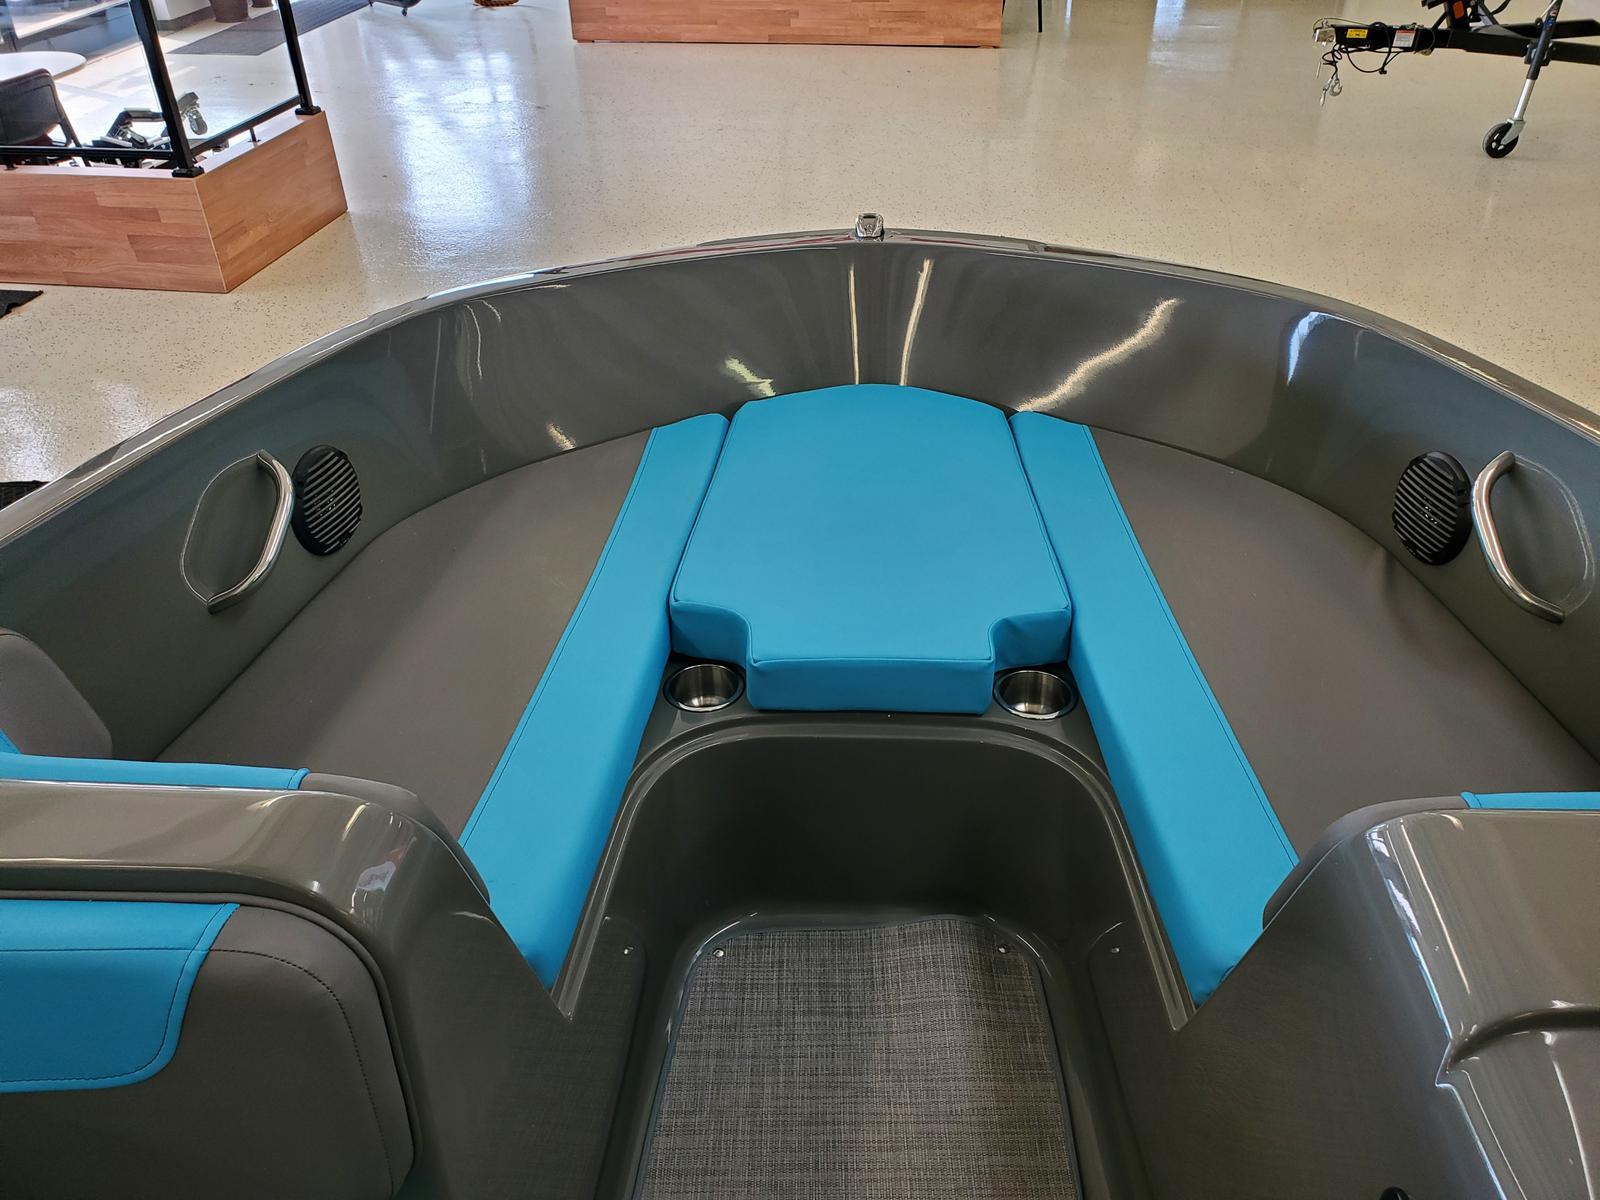 2021 Bayliner boat for sale, model of the boat is Element E18 & Image # 3 of 7